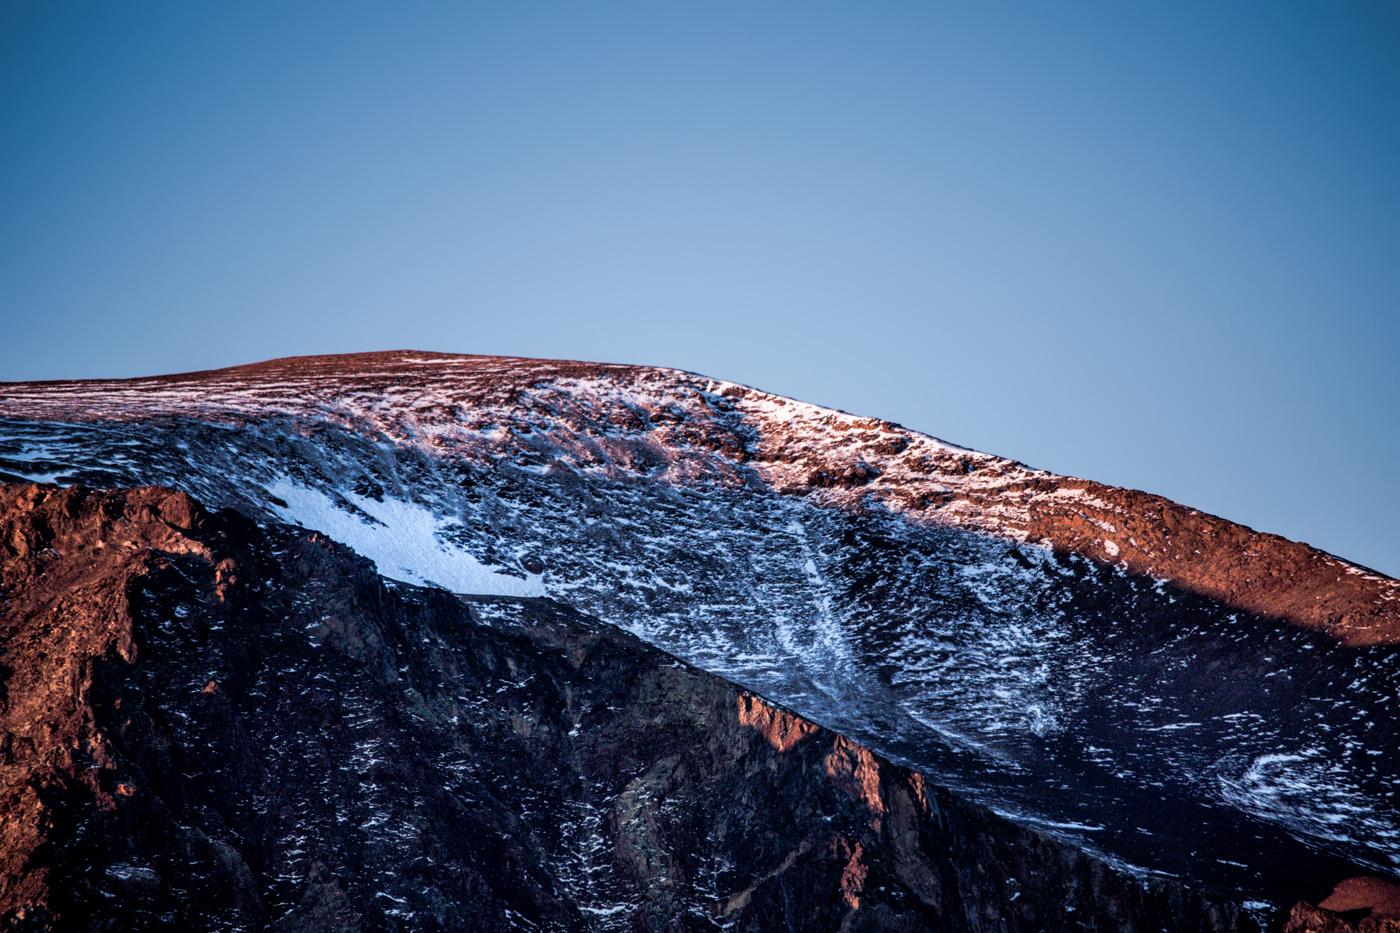 Autumn Cold Mountaintop - Eastern Sierra